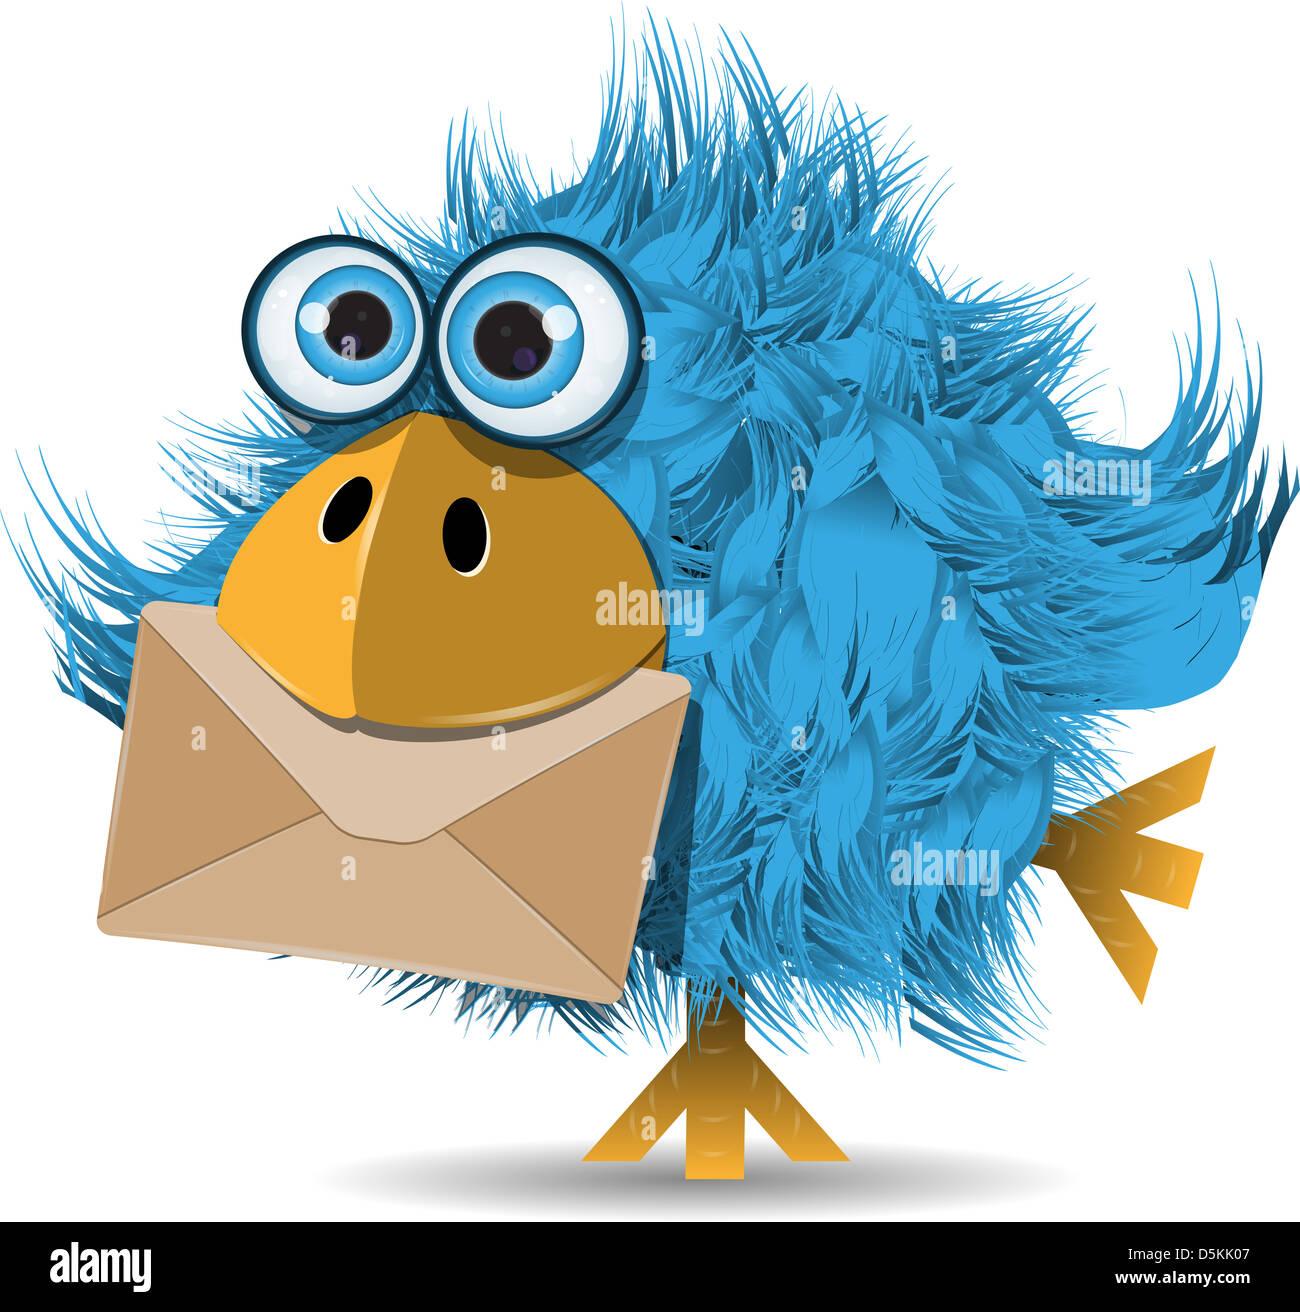 Monster Bird Stock Photos & Monster Bird Stock Images - Page